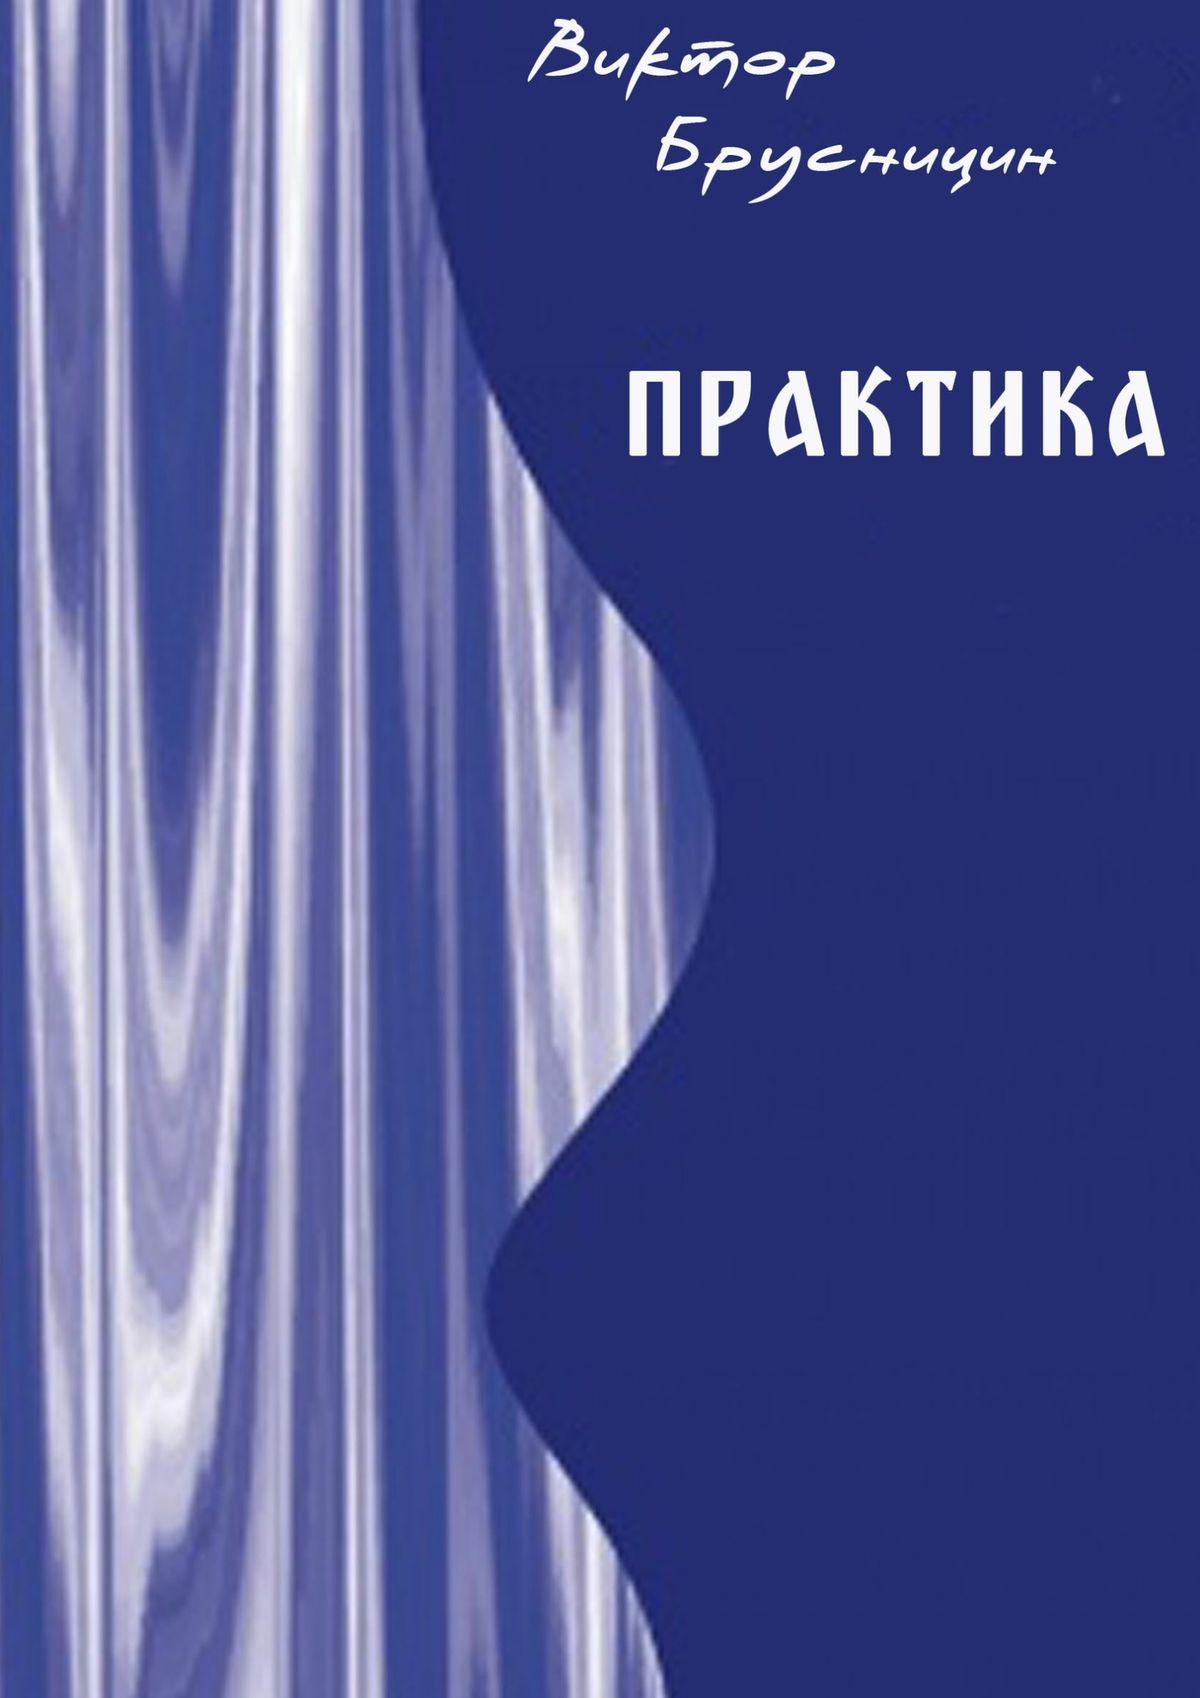 Виктор Брусницин Практика автор не указан устами младенца